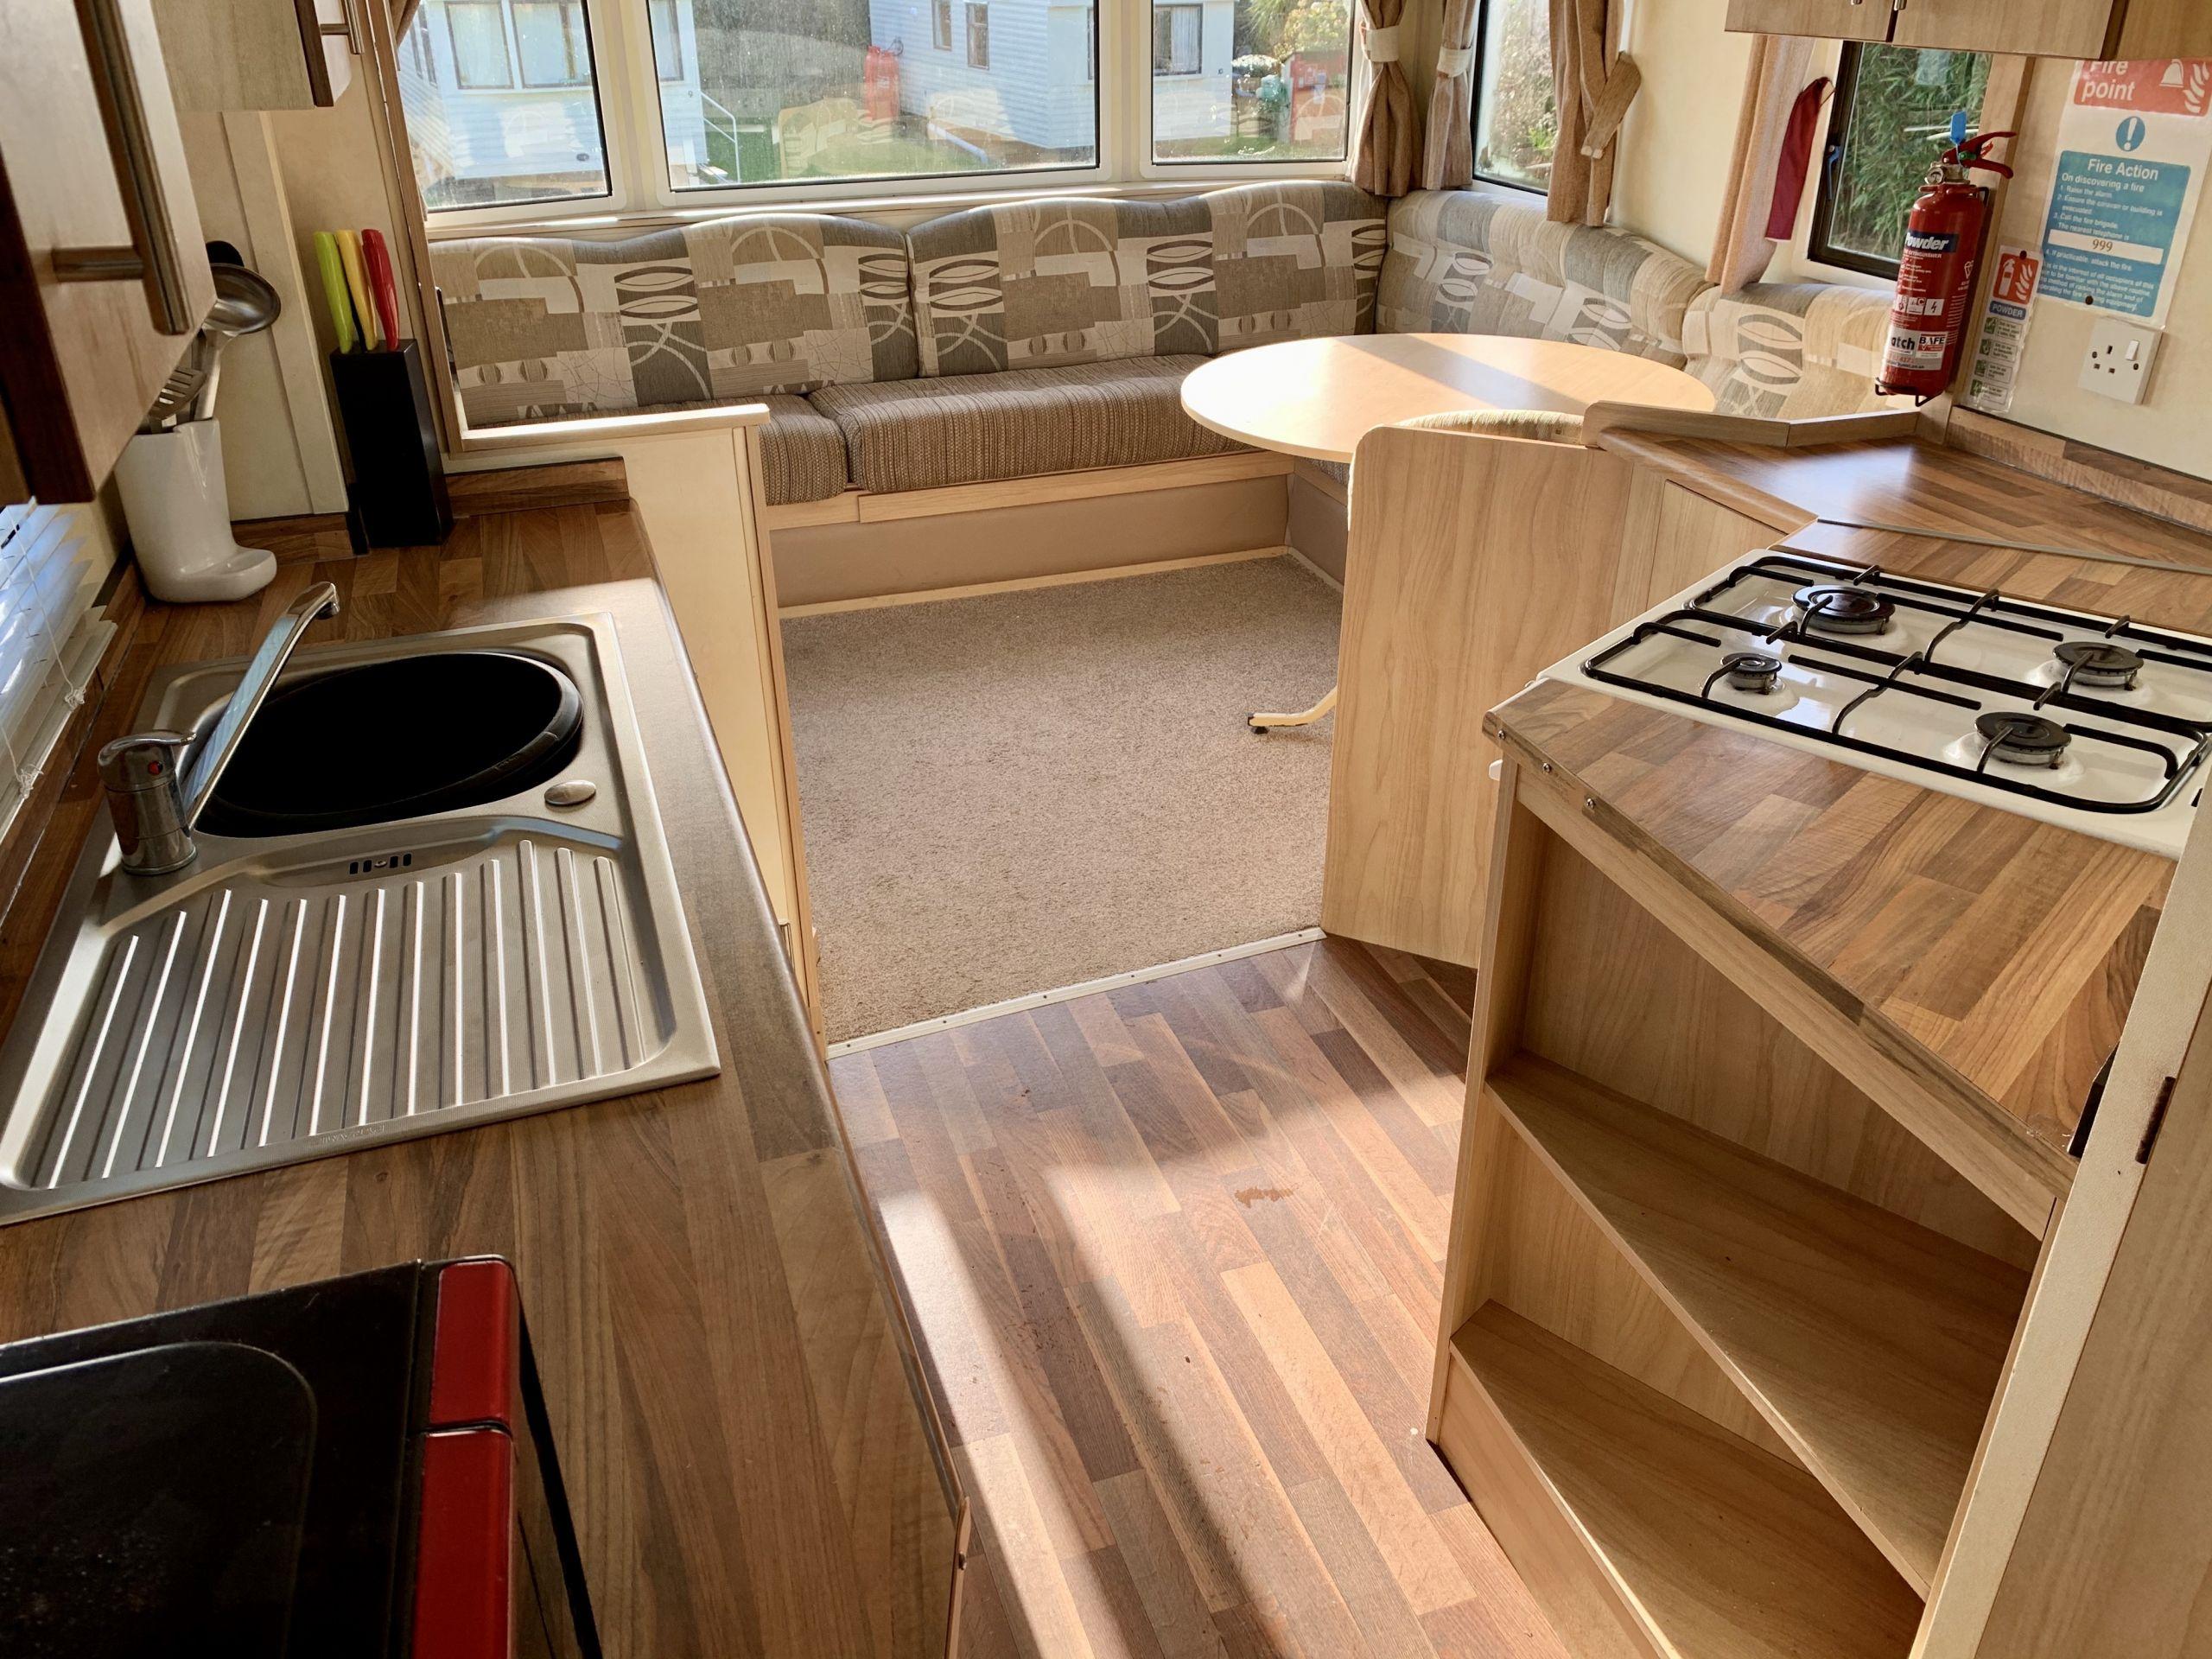 Lamorna hoilday home. living room area , Roselands caravan park St Just